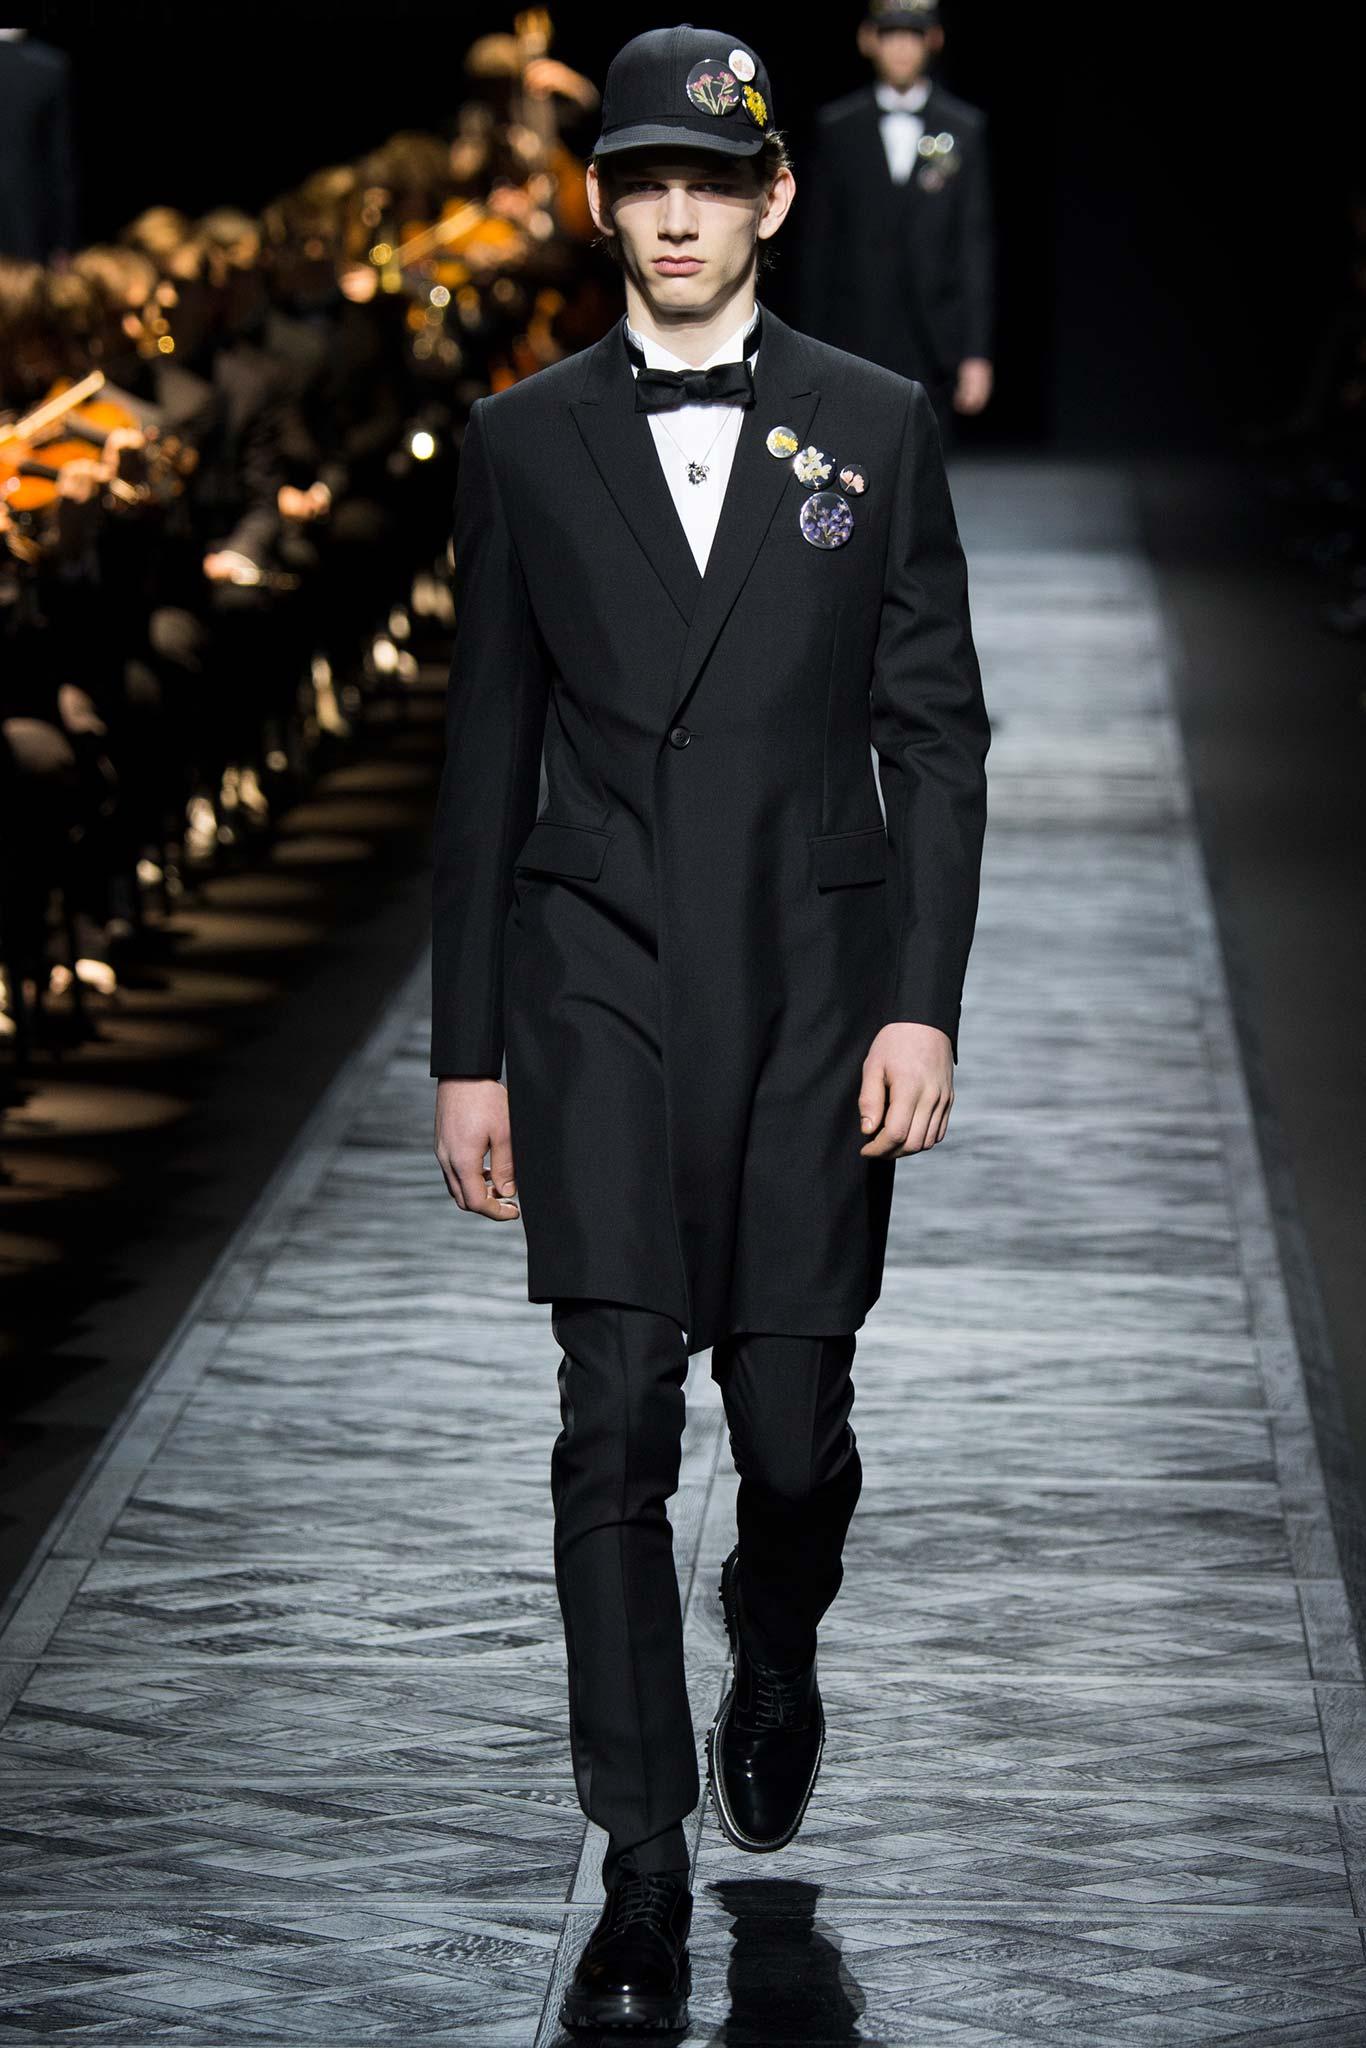 Dior Homme Menswear FW 2015 Paris